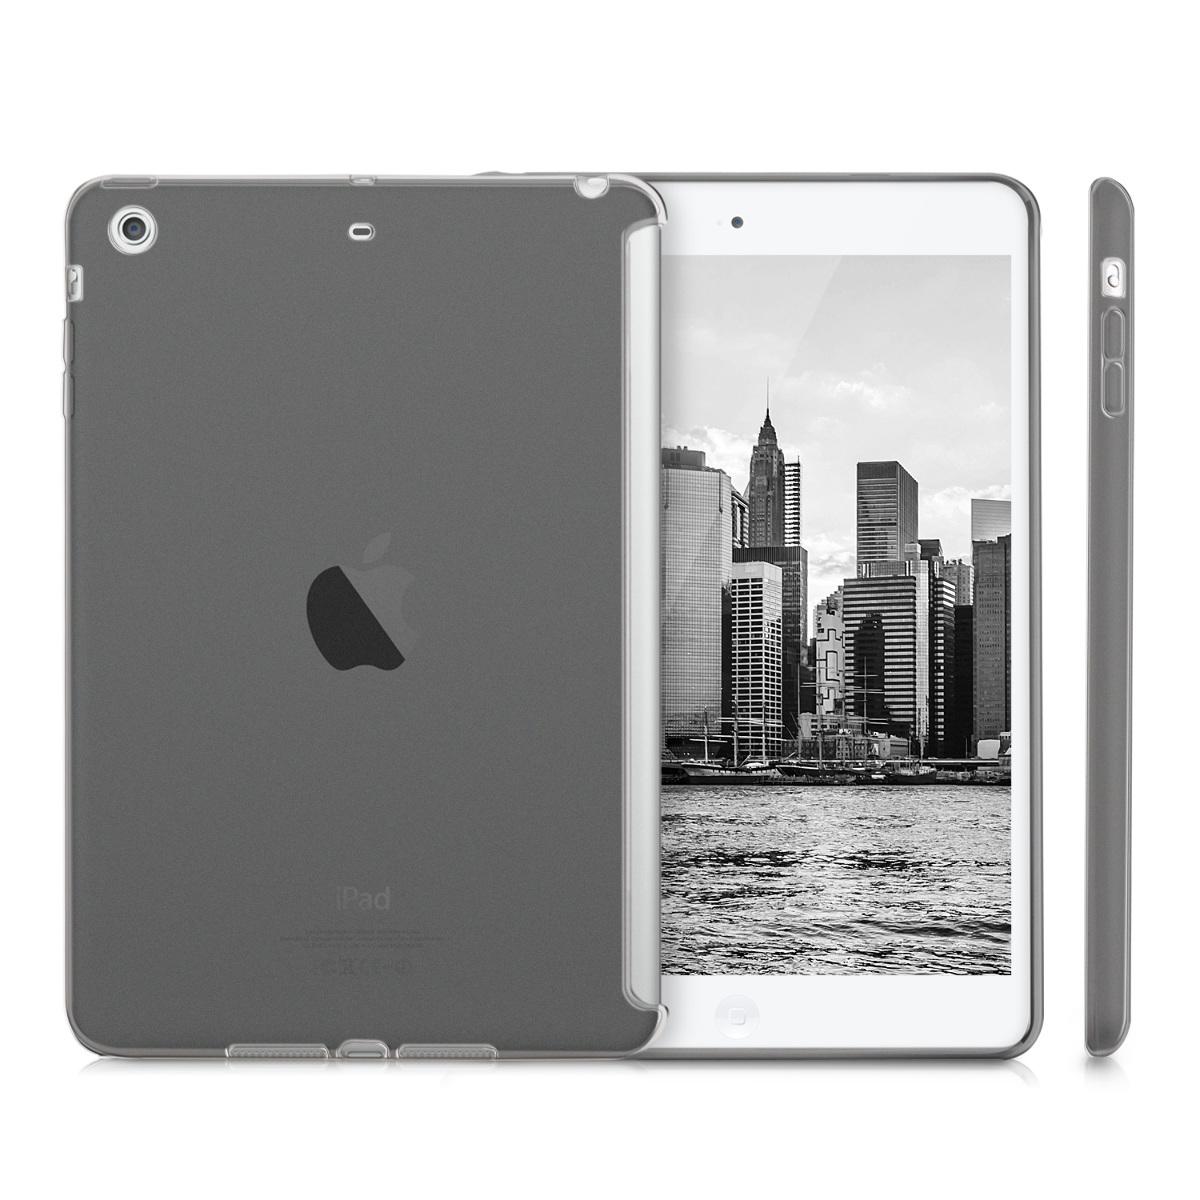 kwmobile tpu silicone cover for apple ipad mini 2 retina. Black Bedroom Furniture Sets. Home Design Ideas